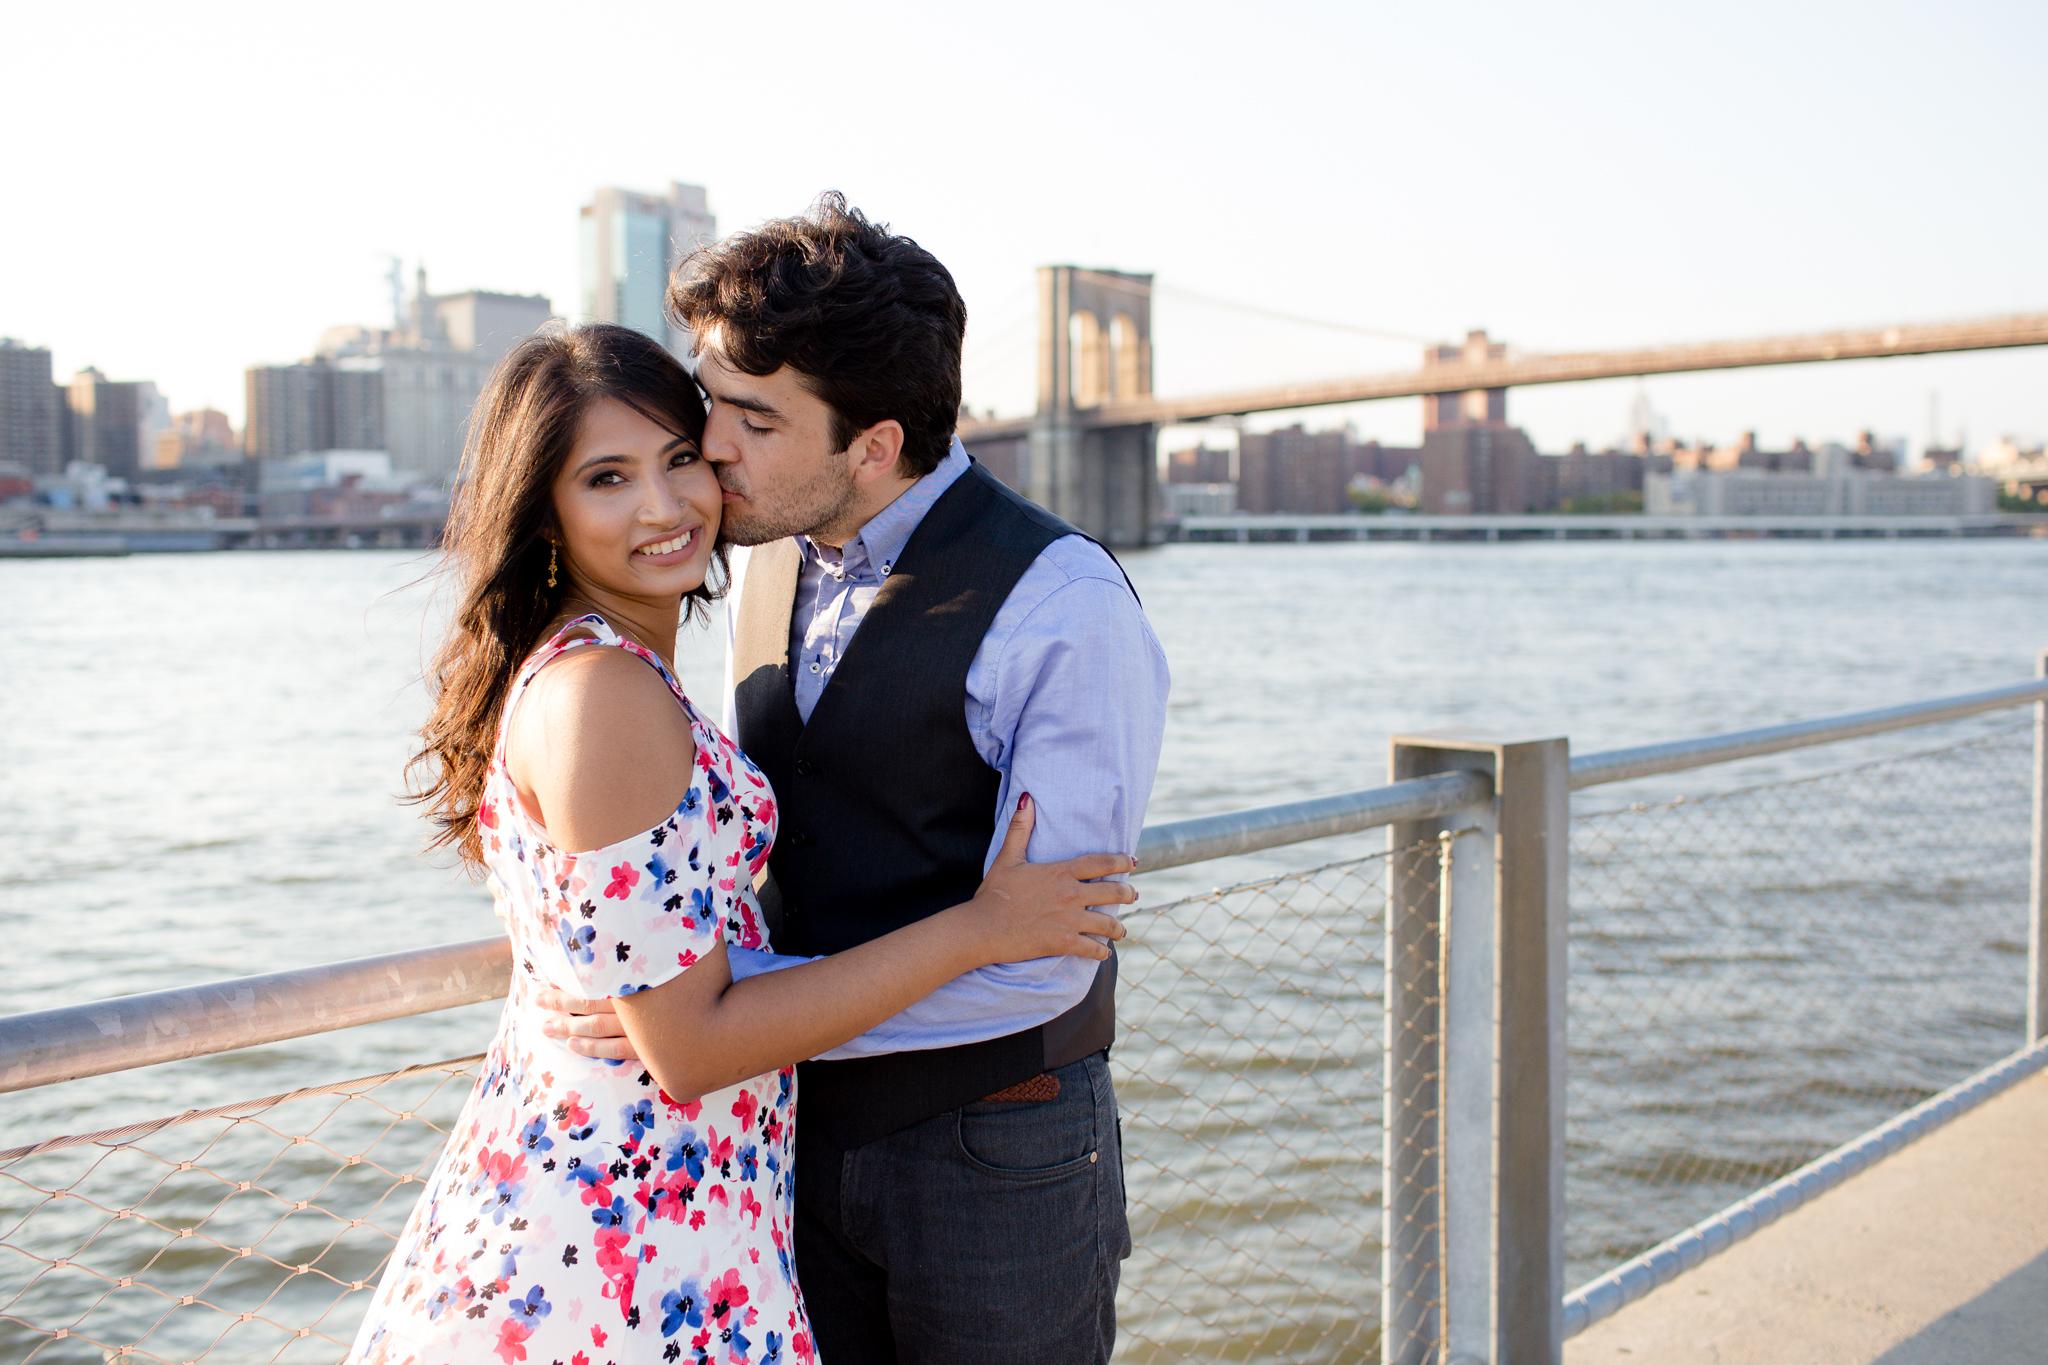 engagement-photography-brooklyn-bridge-park-4351.jpg